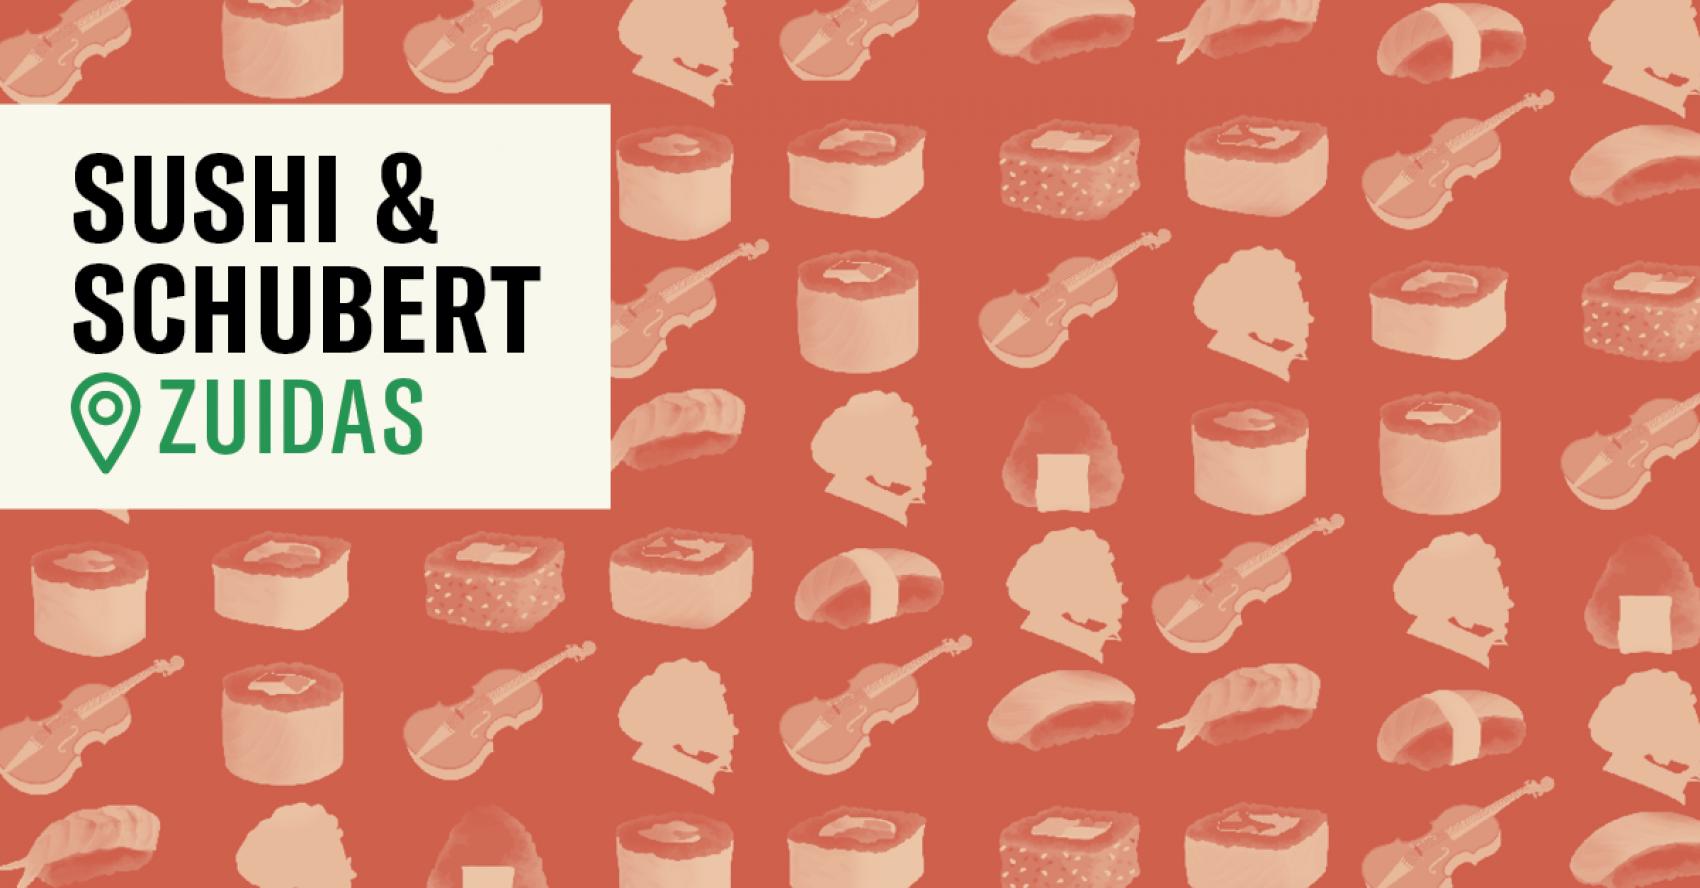 Sushi & Schubert @ Zuidas